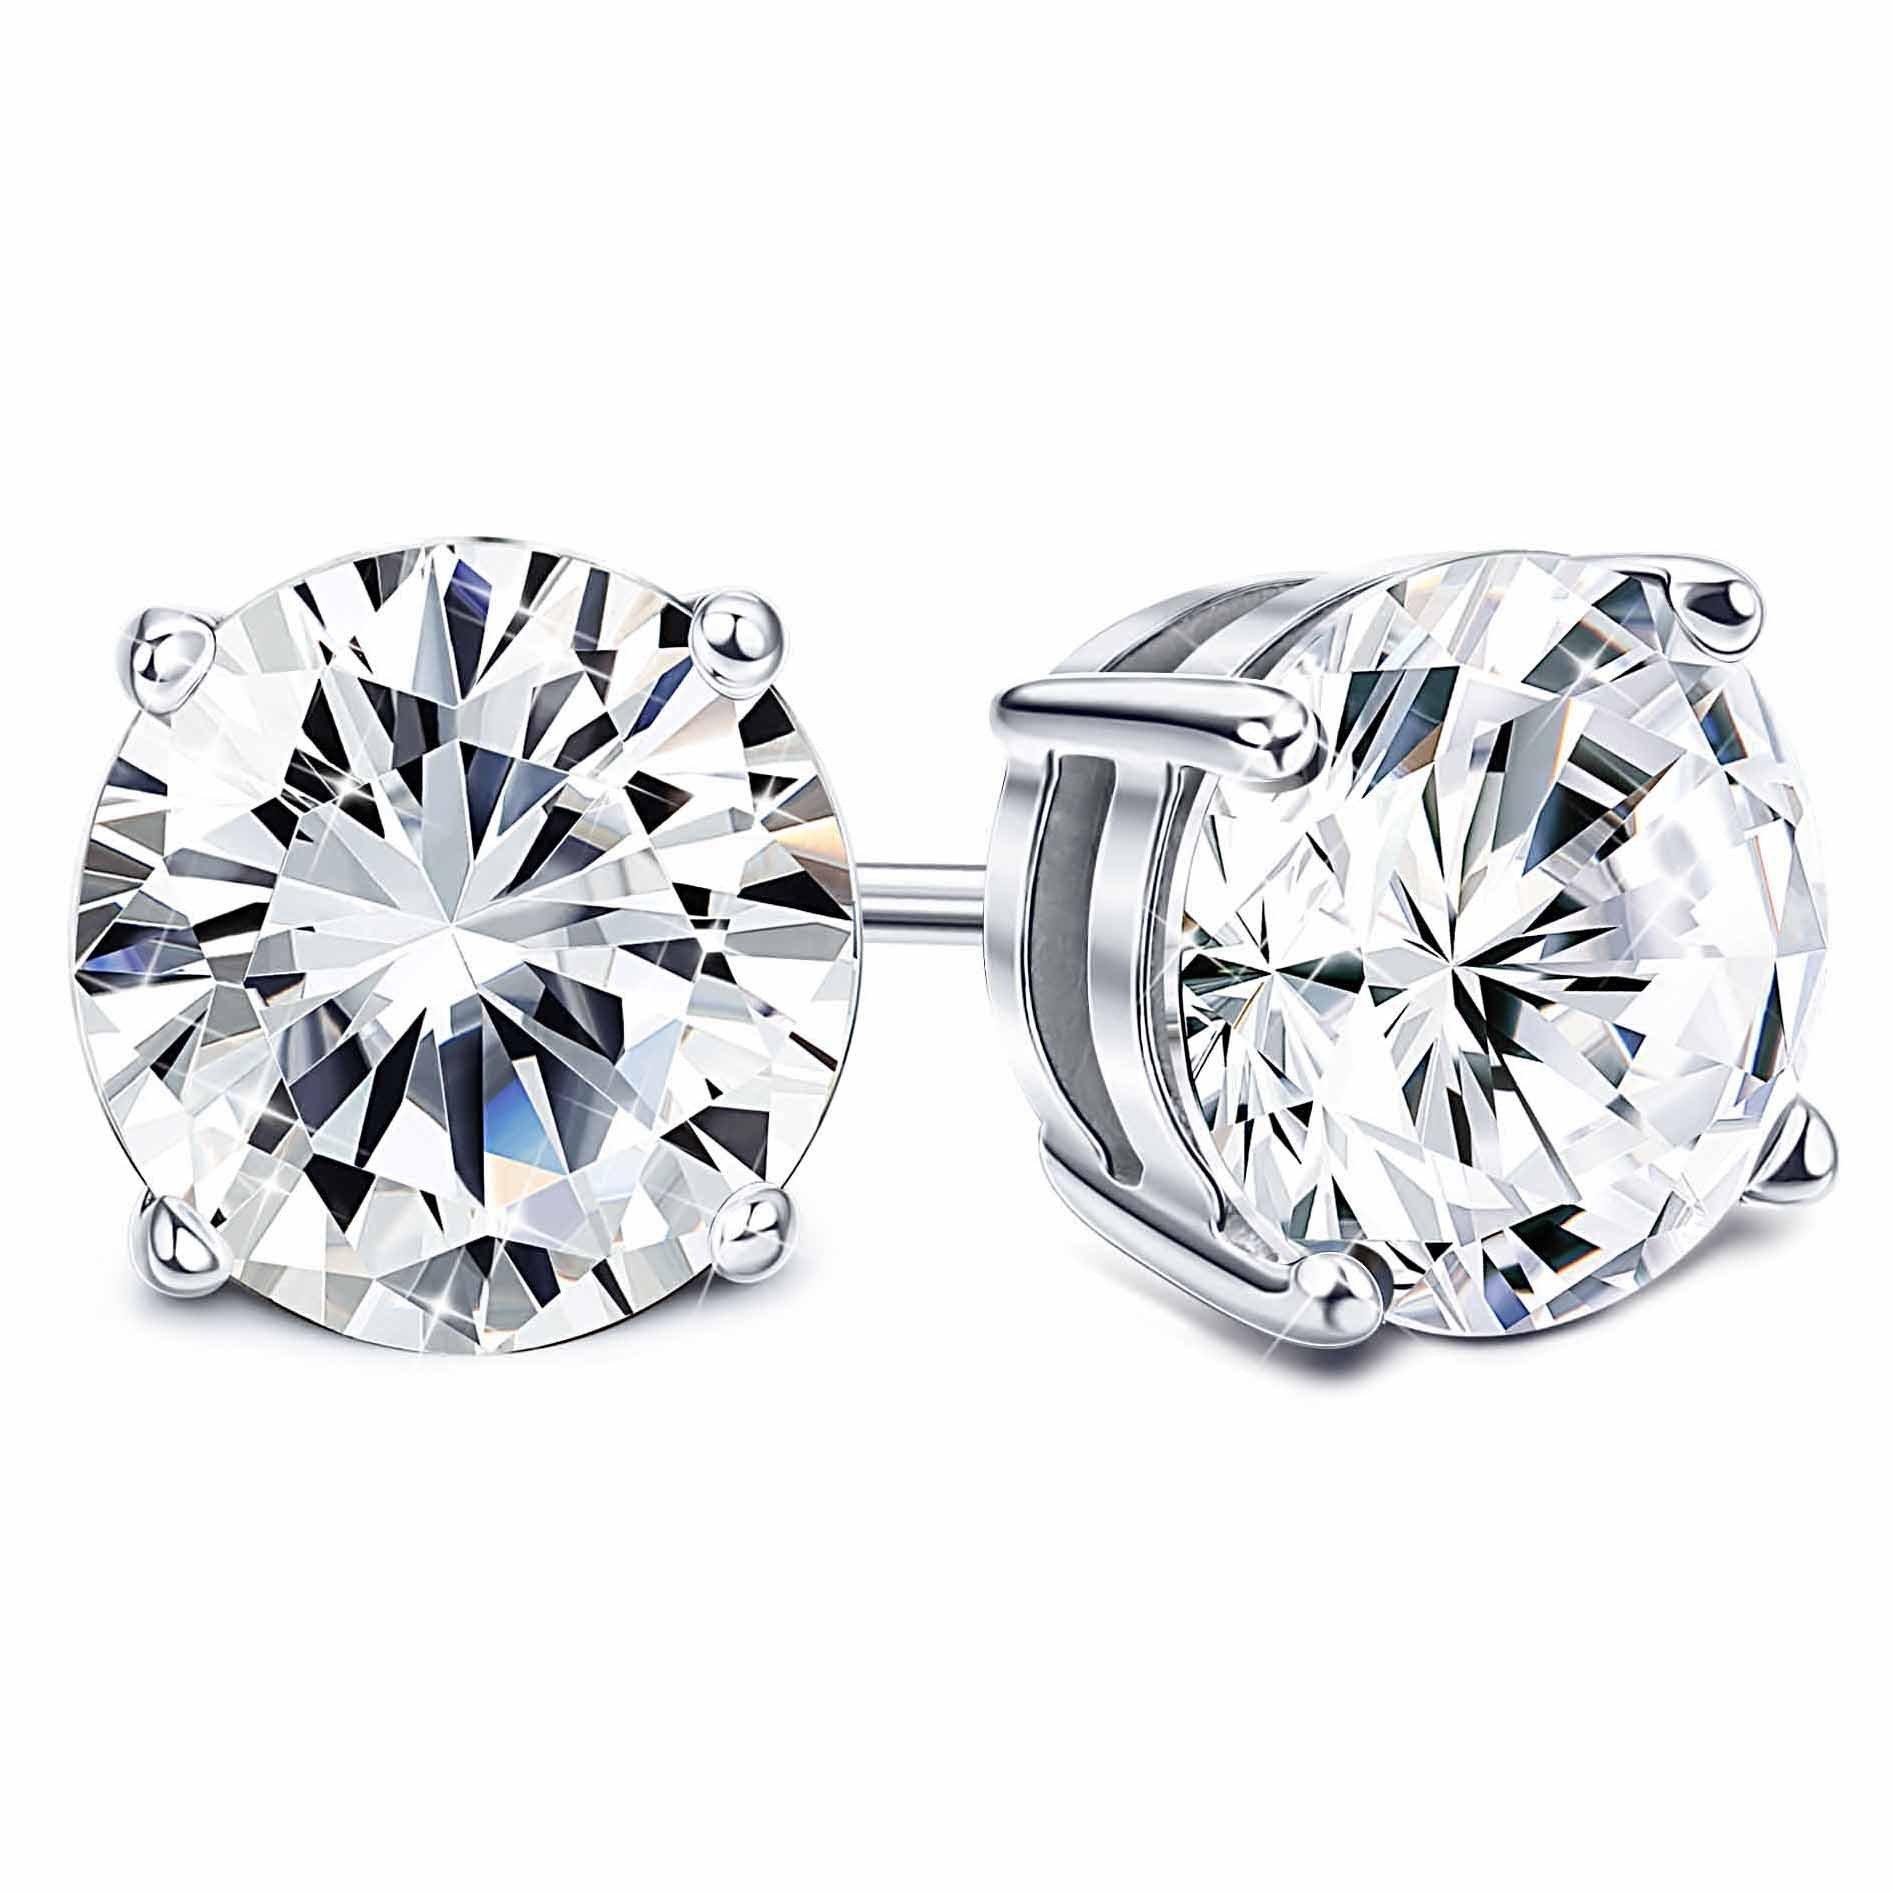 Sllaiss 925 Sterling Silver Earrings Swarovski Pure Brilliance Cubic Zirconia Stud Earrings for Women 4-Prong CZ 2.00cttw